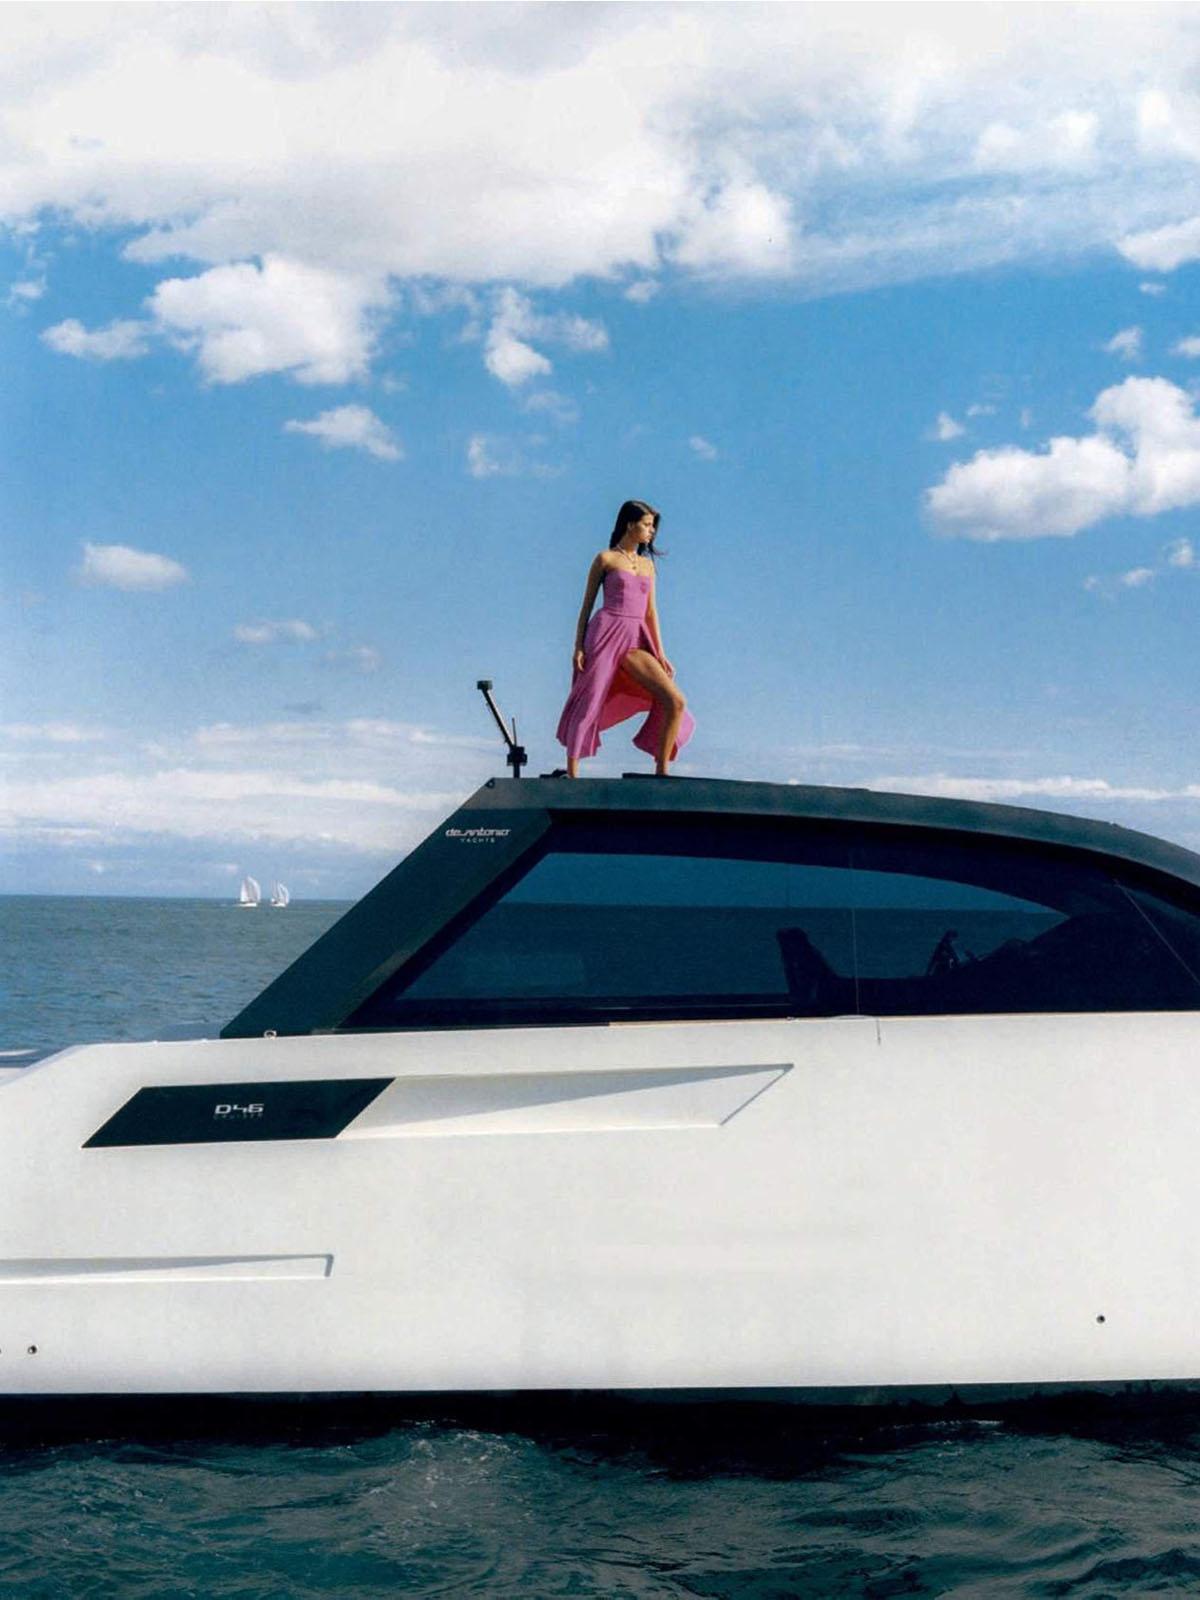 Paula Anguera by Josep Moré for Vogue Spain June 2021